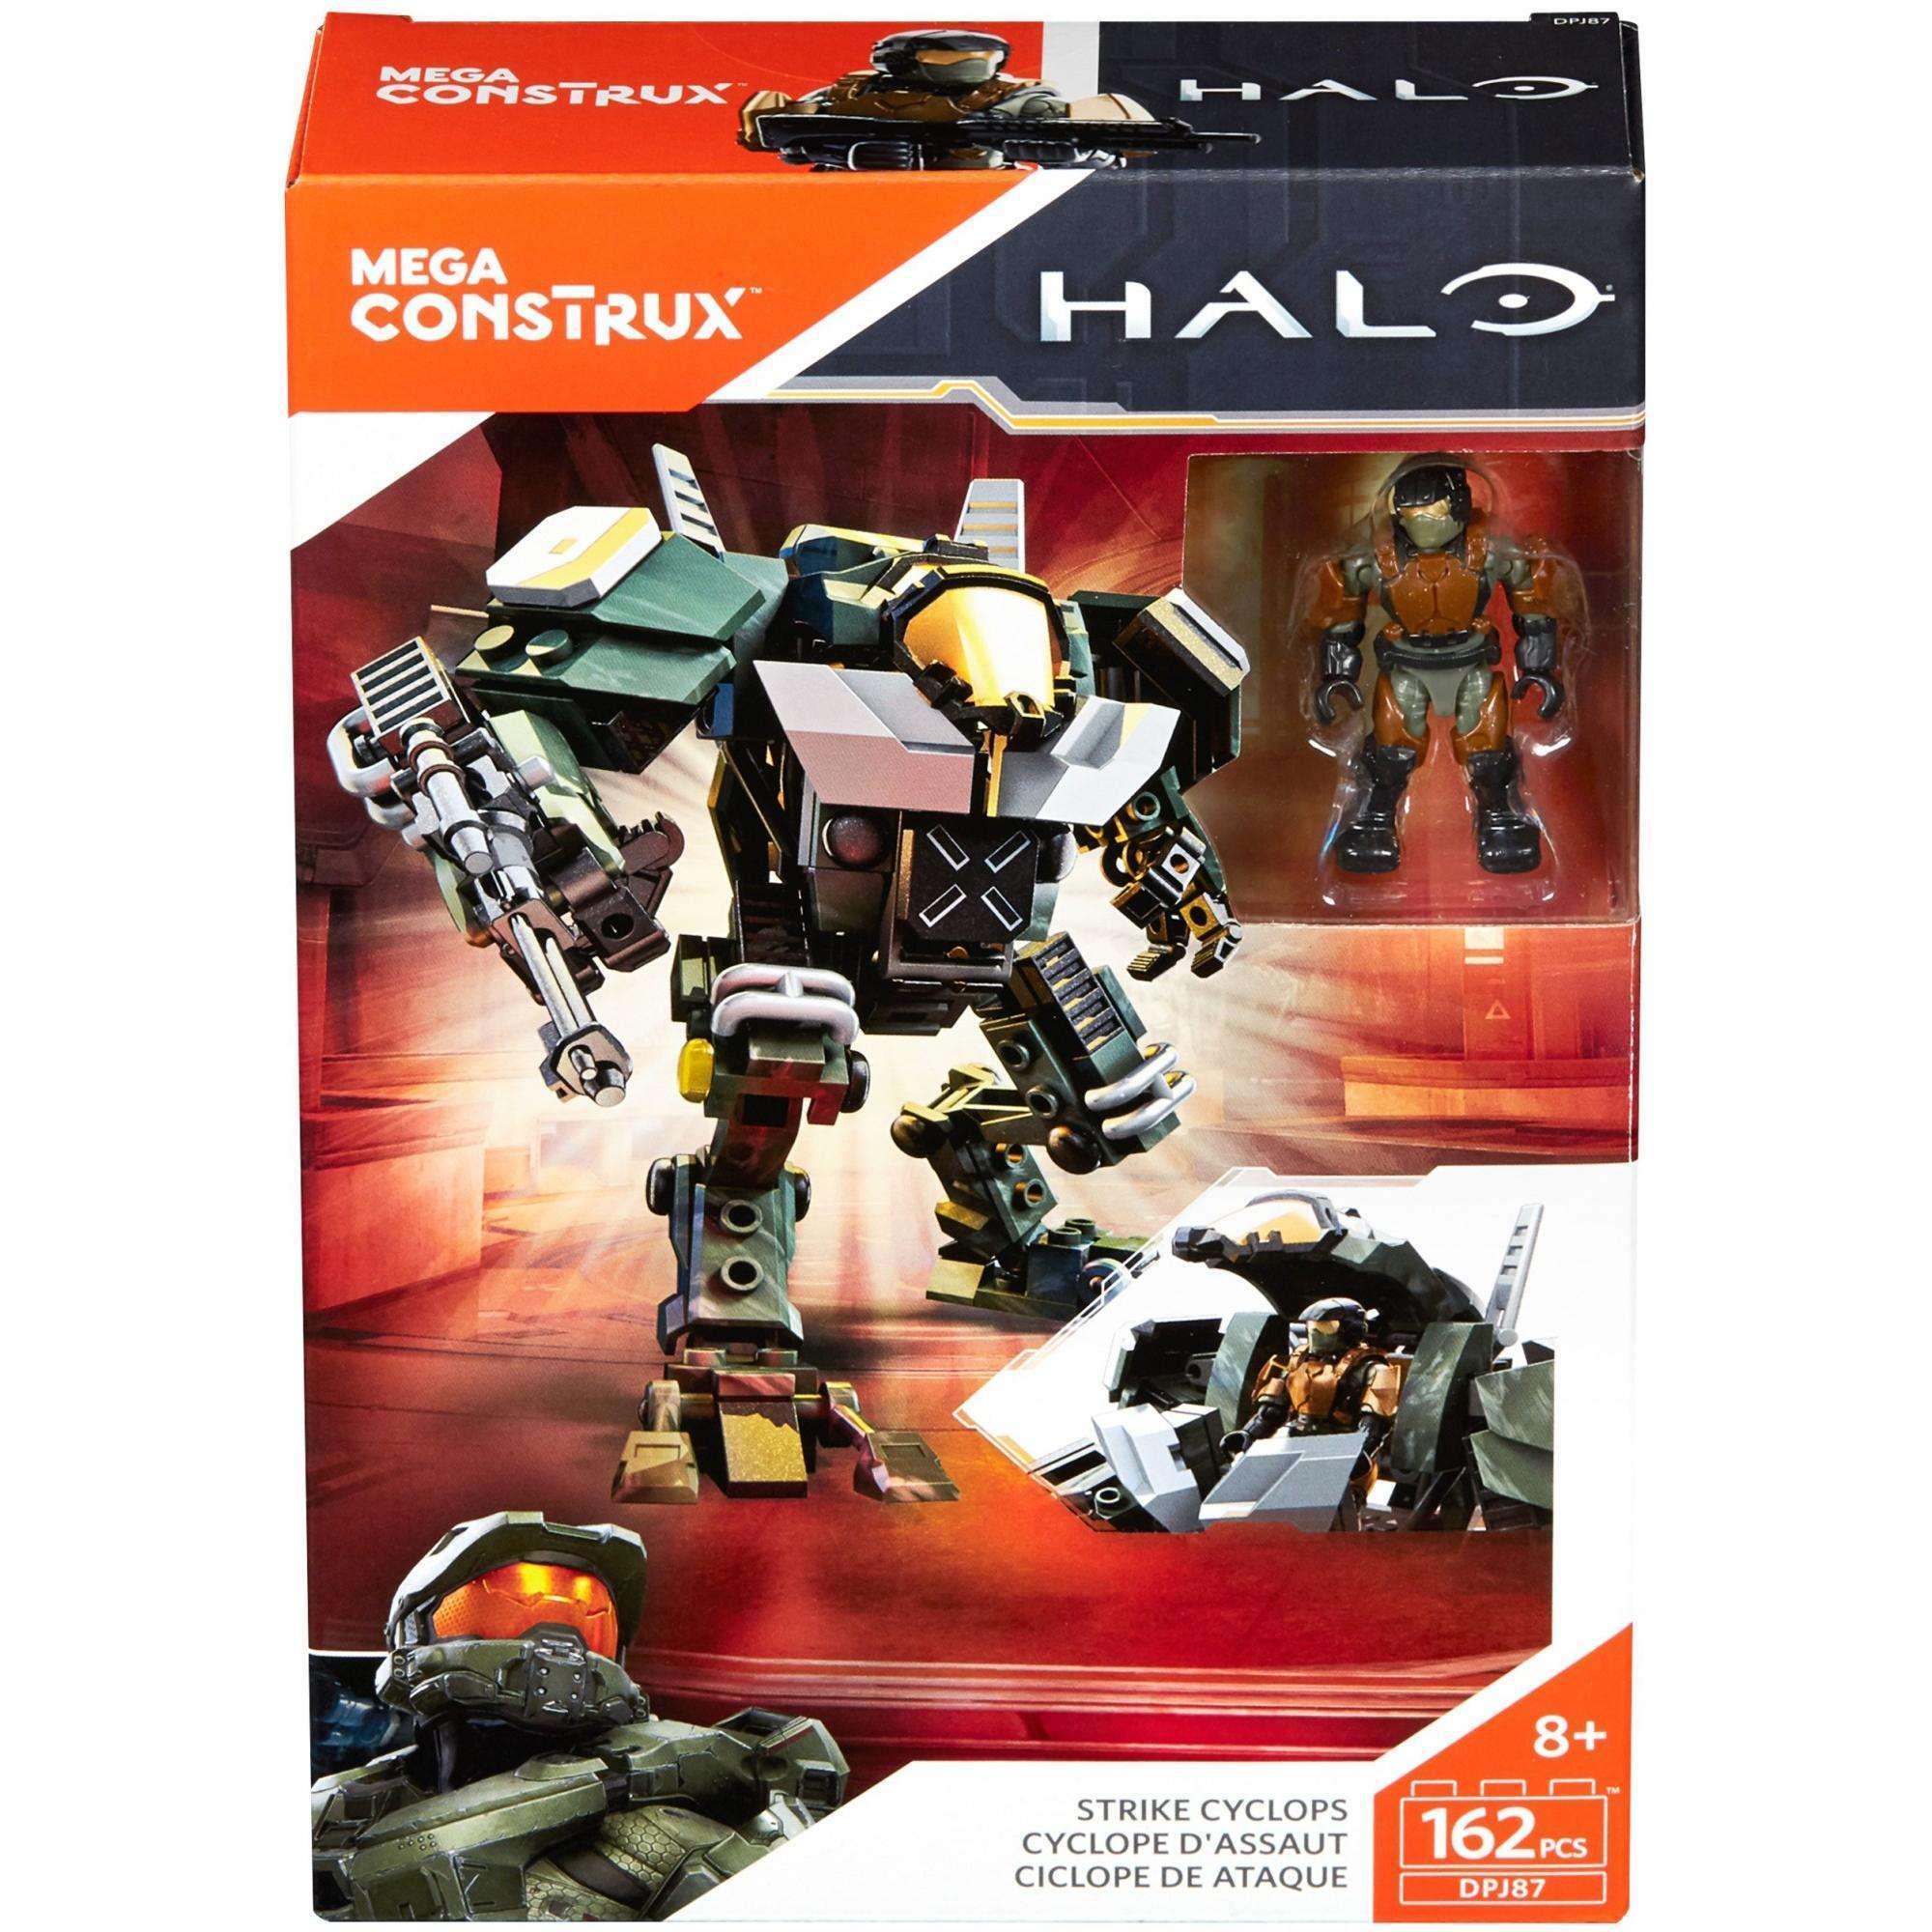 Mega Construx Halo Strike Cyclops